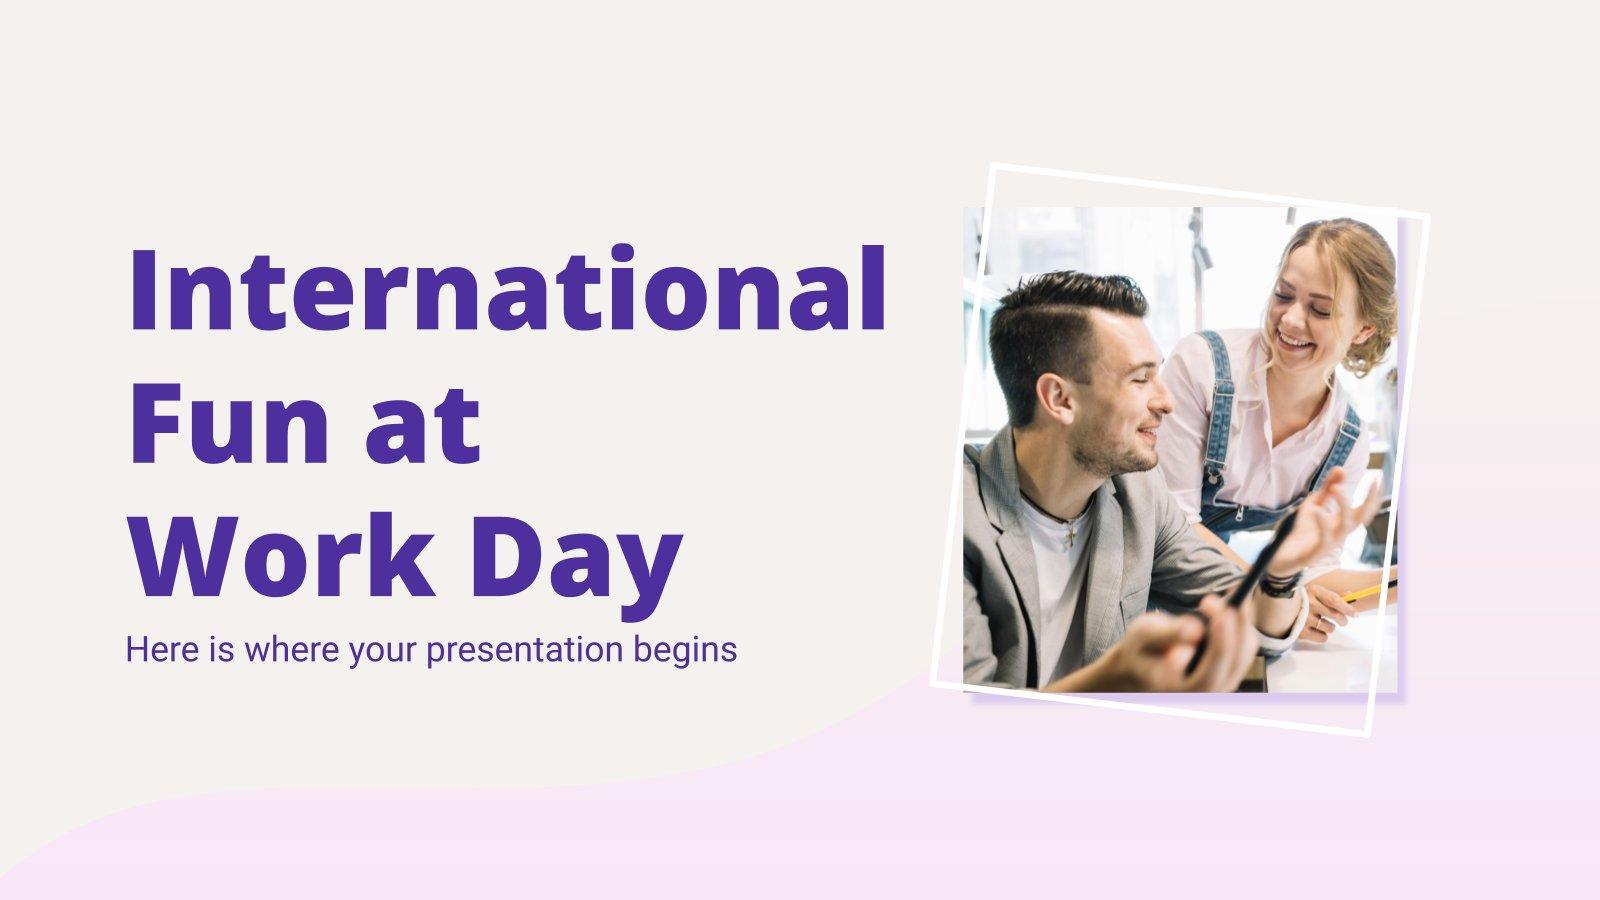 International Fun at Work Day presentation template